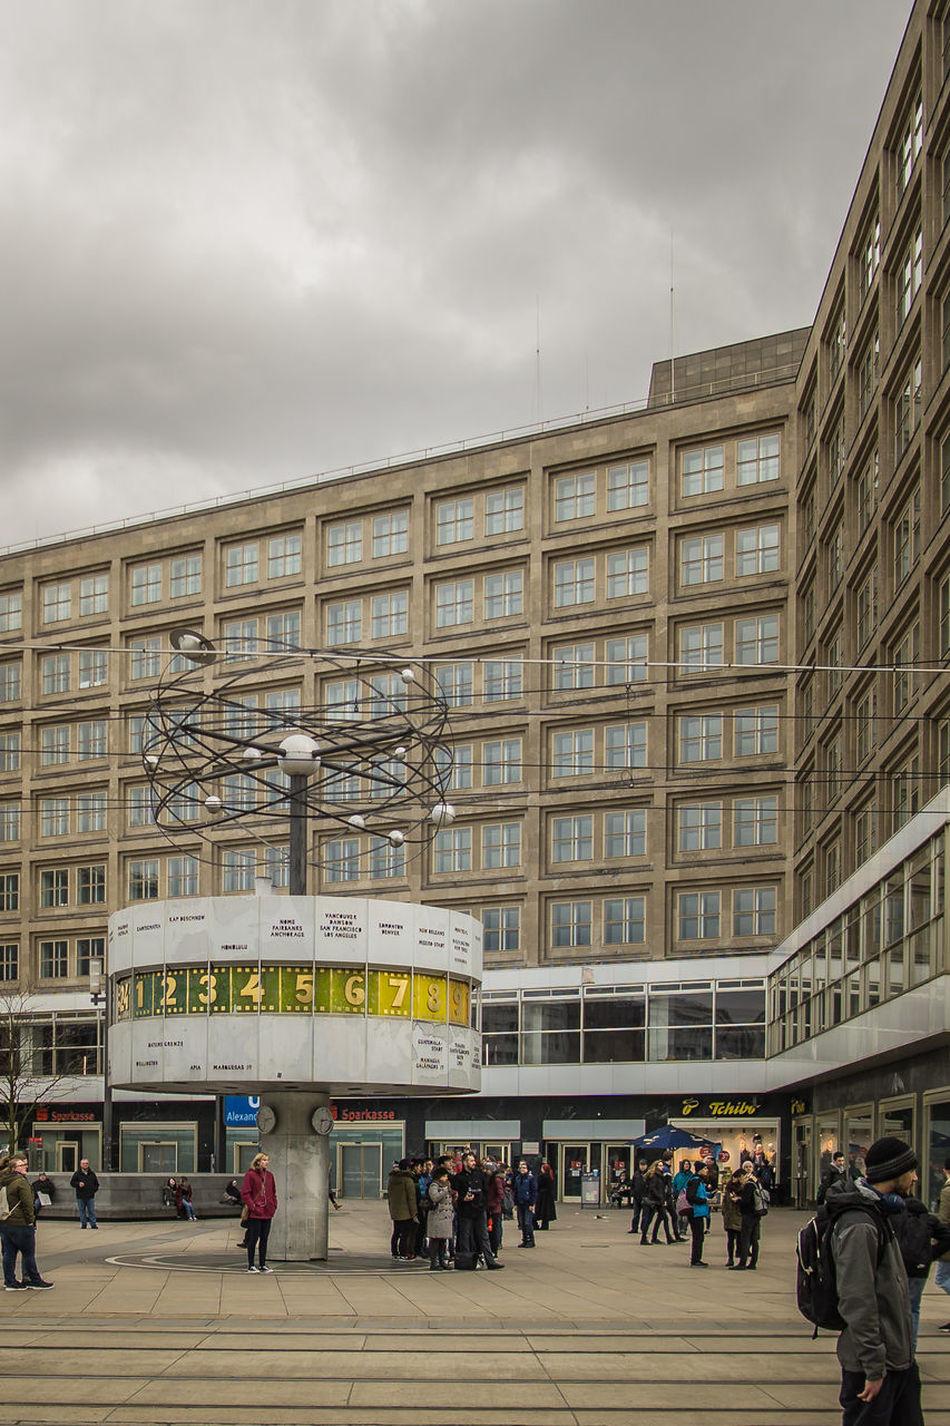 Weltzeituhr Alexanderplatz Berlin Heikobo City Berlin Alexanderplatz Weltzeituhr Berlin Photography Berliner Ansichten Berlin Mitte